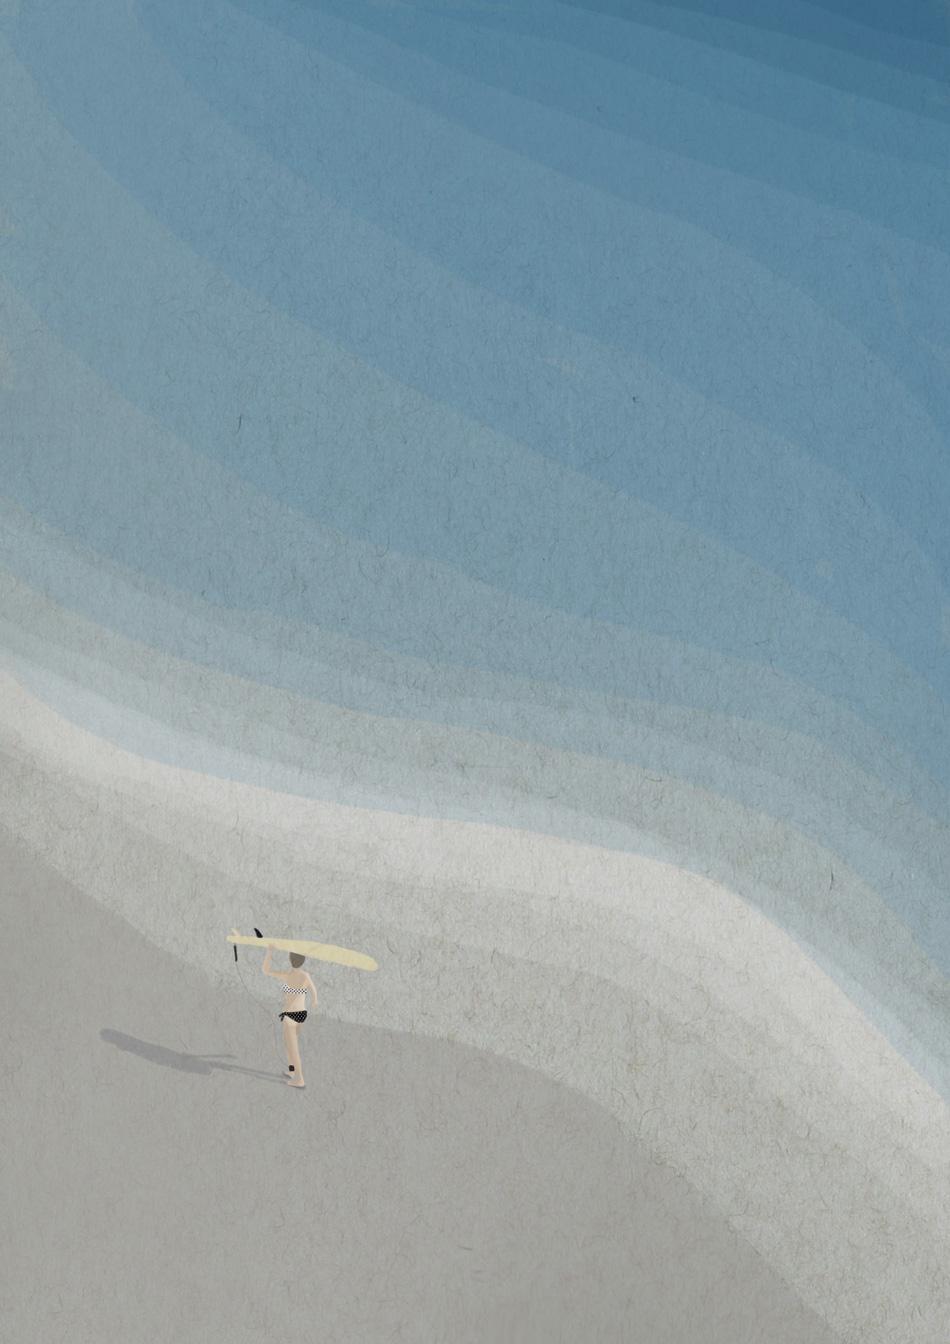 Life's-A-Beach-IX-by-Paola-van-der-Hulst